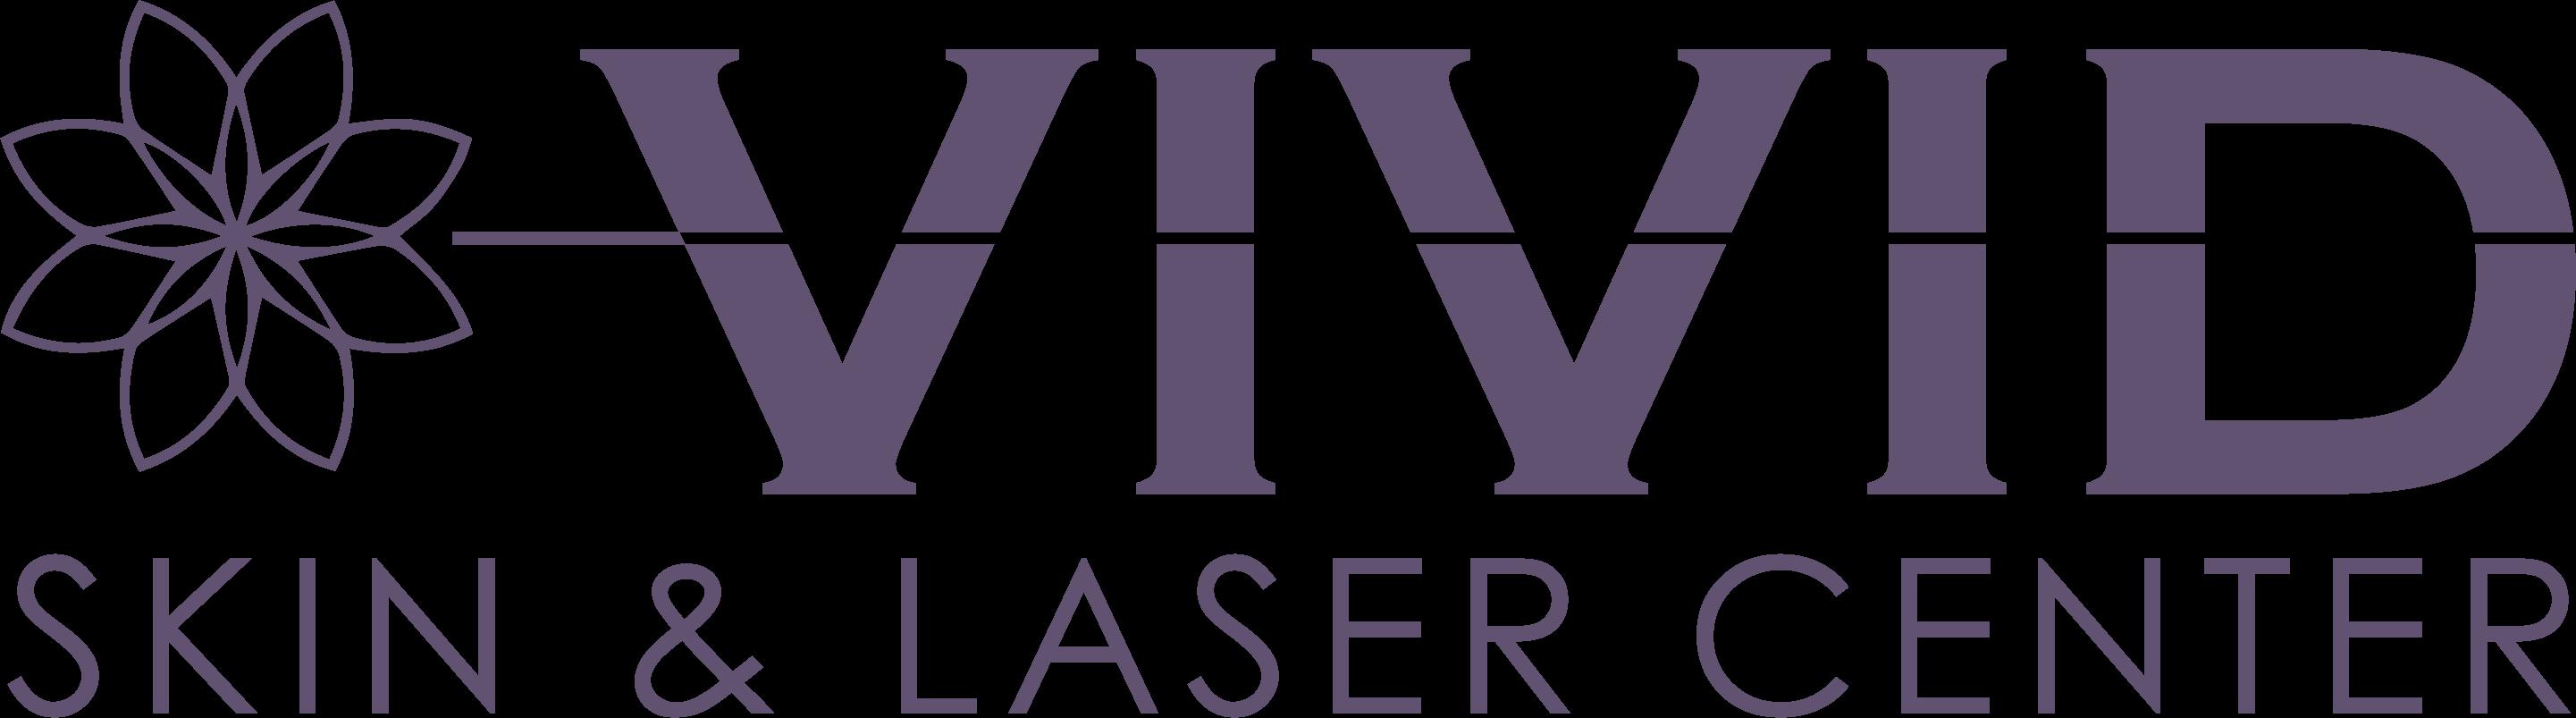 Vivid Skin & Laser Center Logo